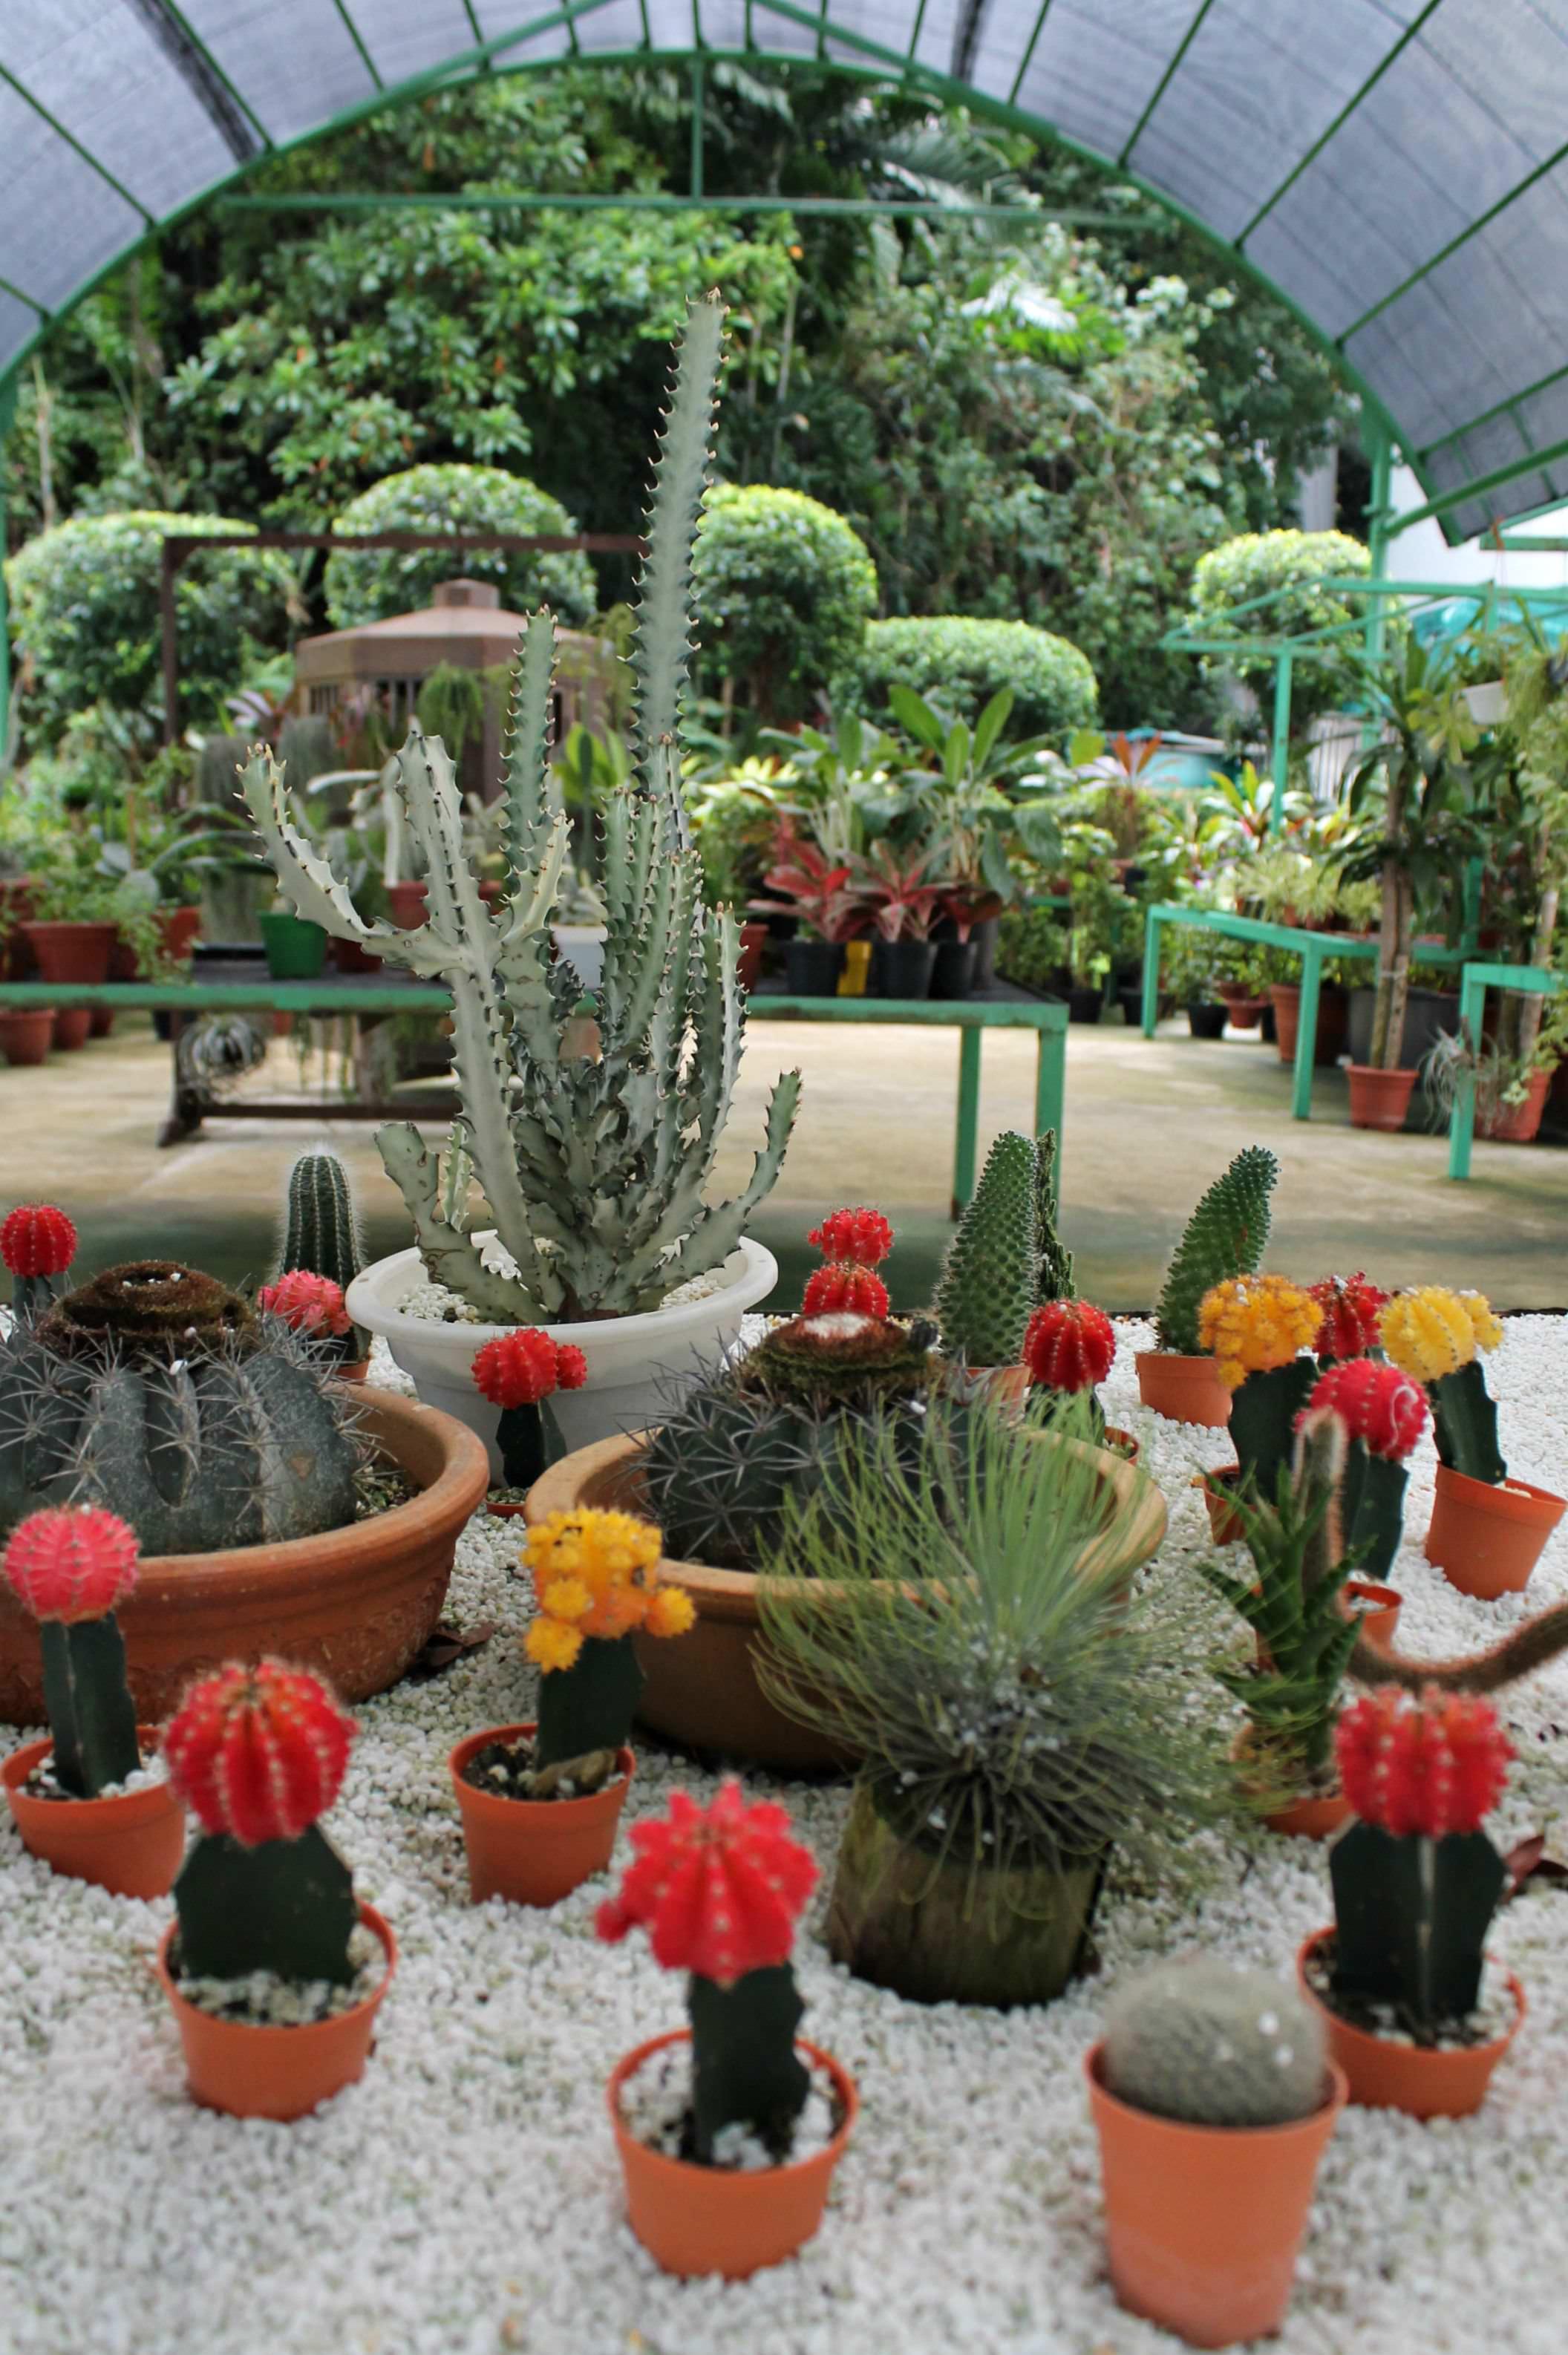 Rasa-Sentosa-resort-and-spa-garden-photo-by-Little-Big-Bell